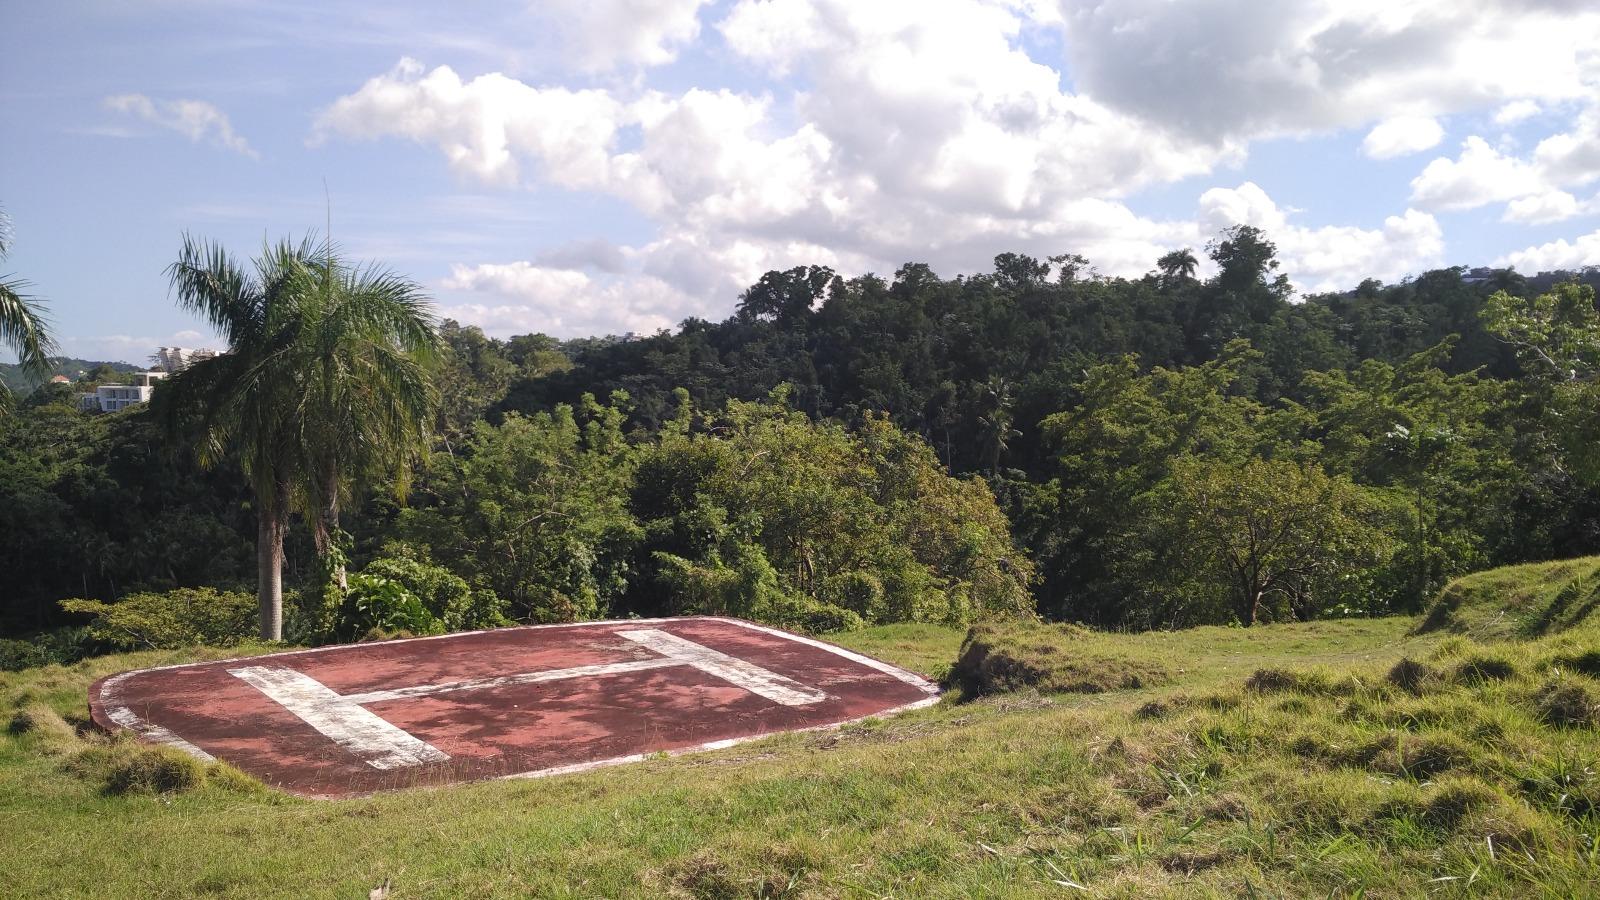 Hill for sale in Las Terrenas Dominican republic 11.jpeg